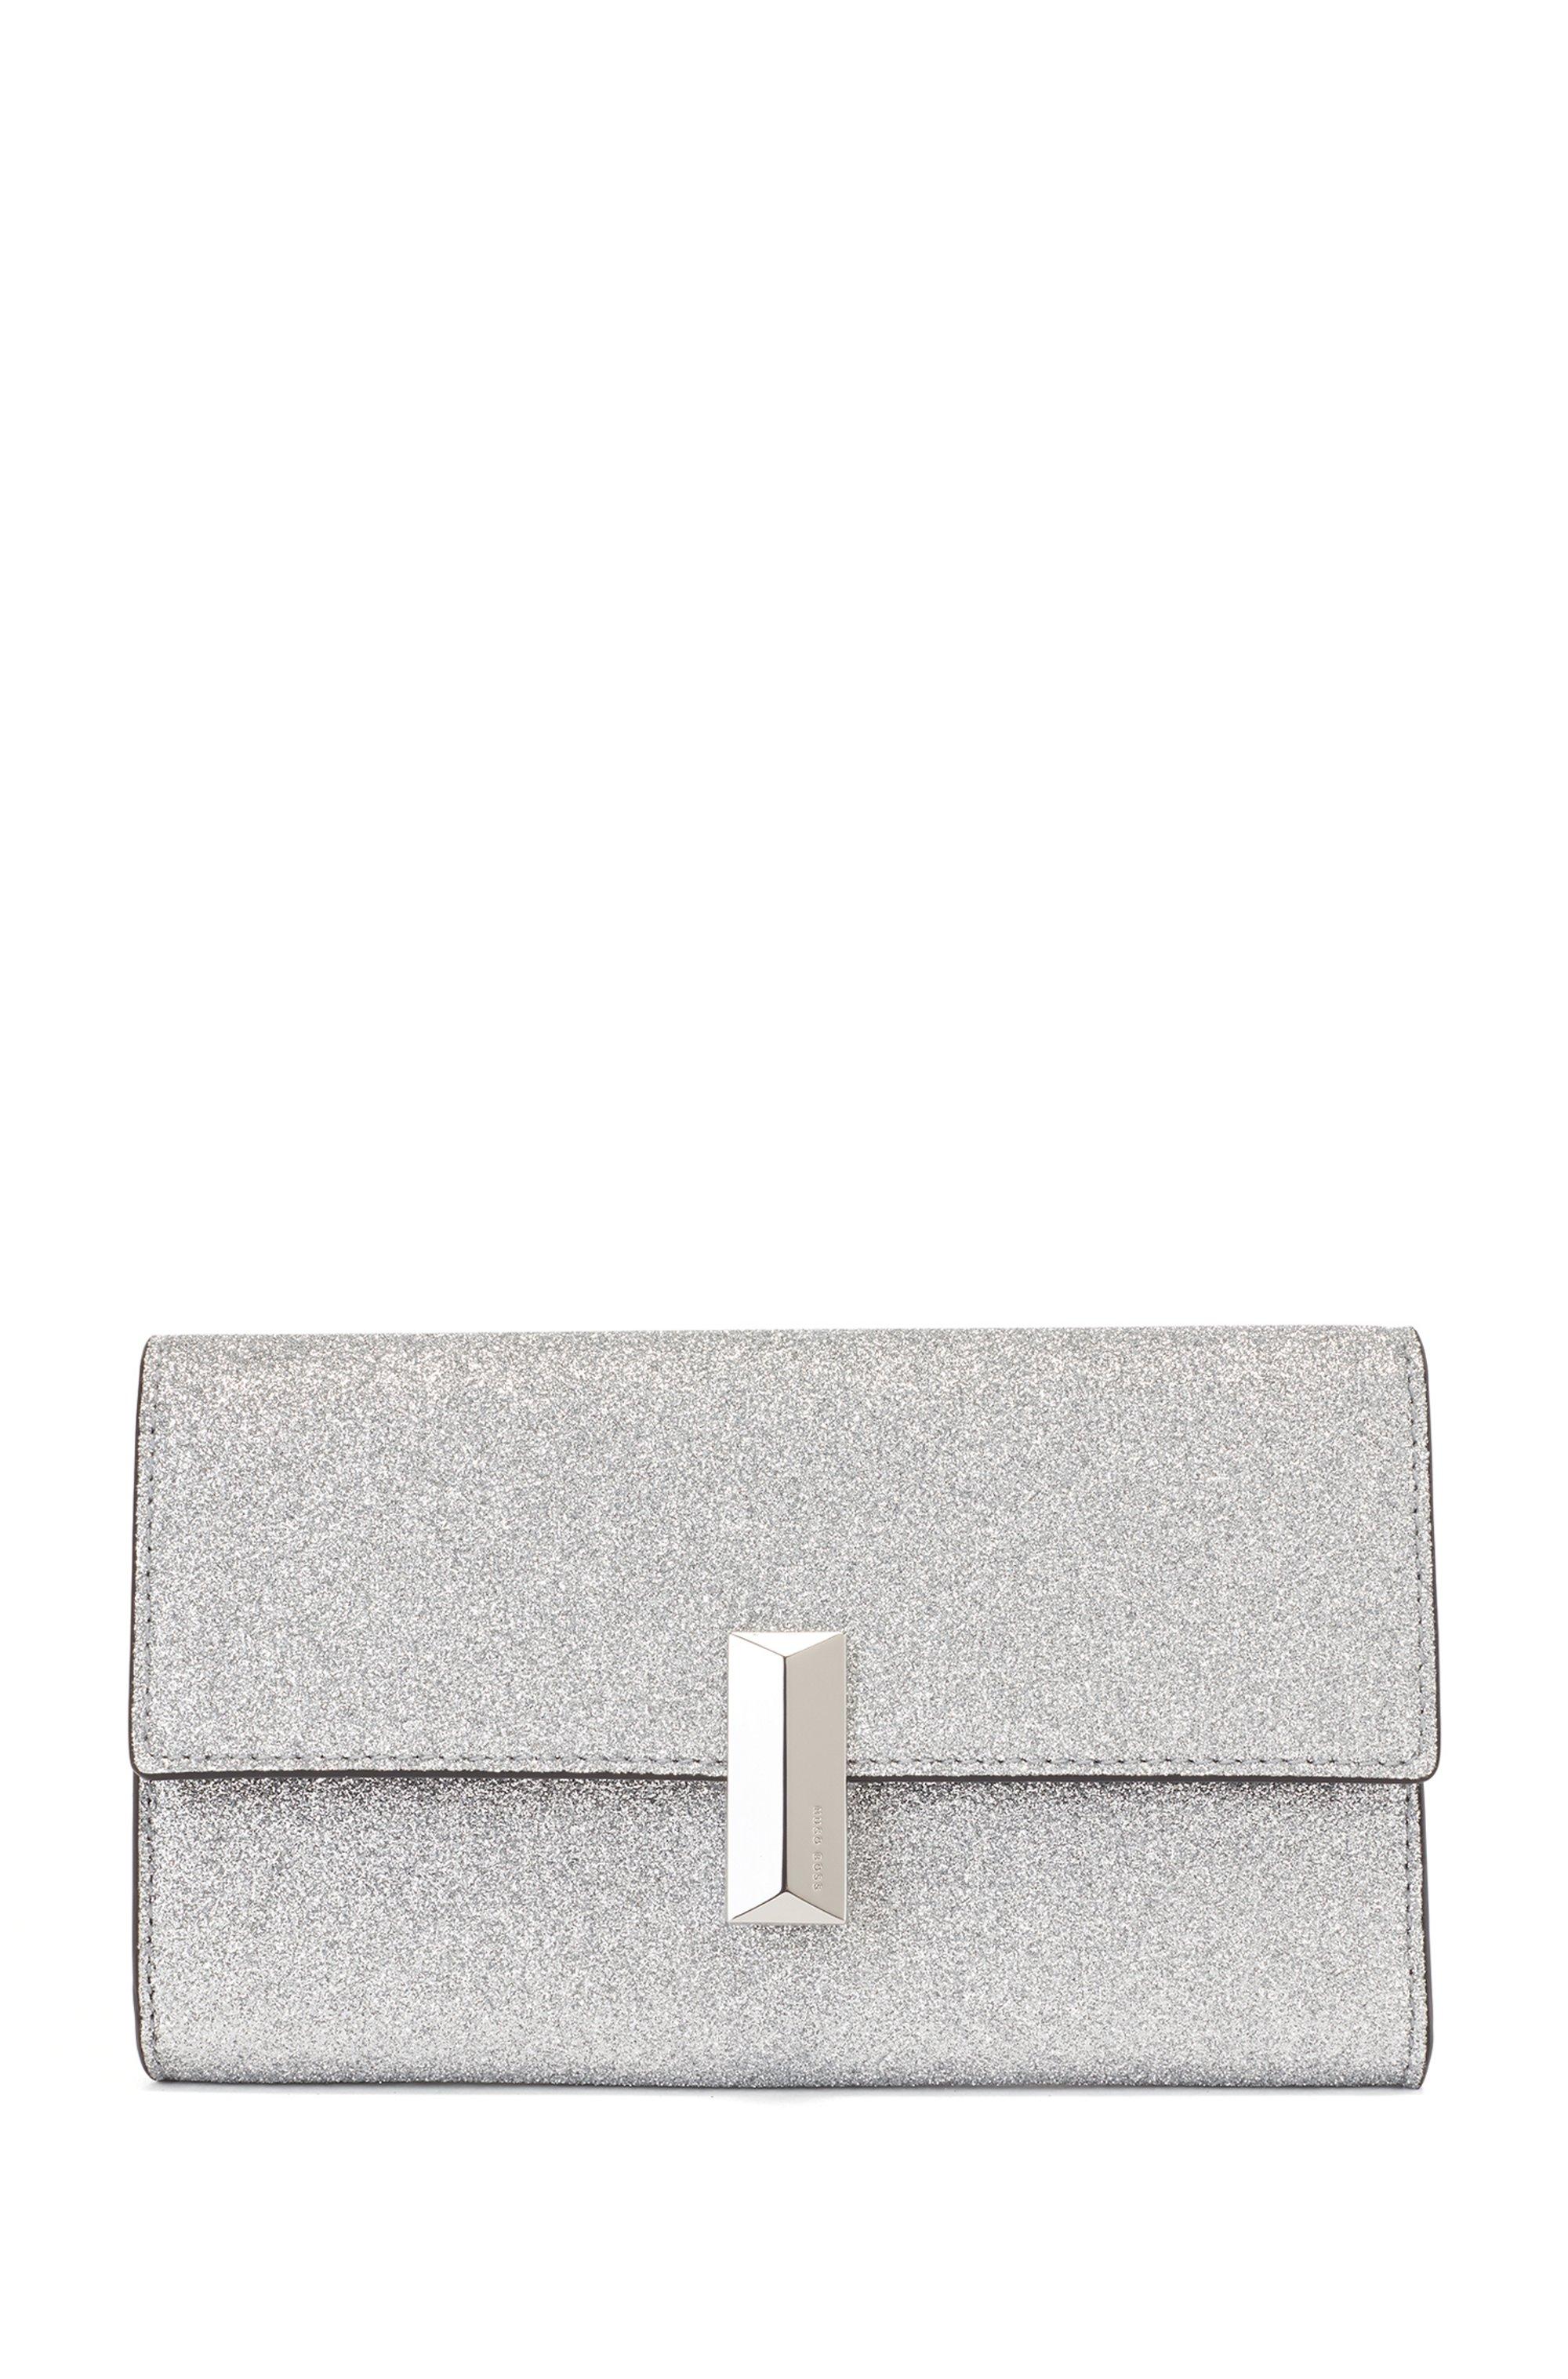 Glitter-fabric clutch bag with detachable wrist chain, Silver